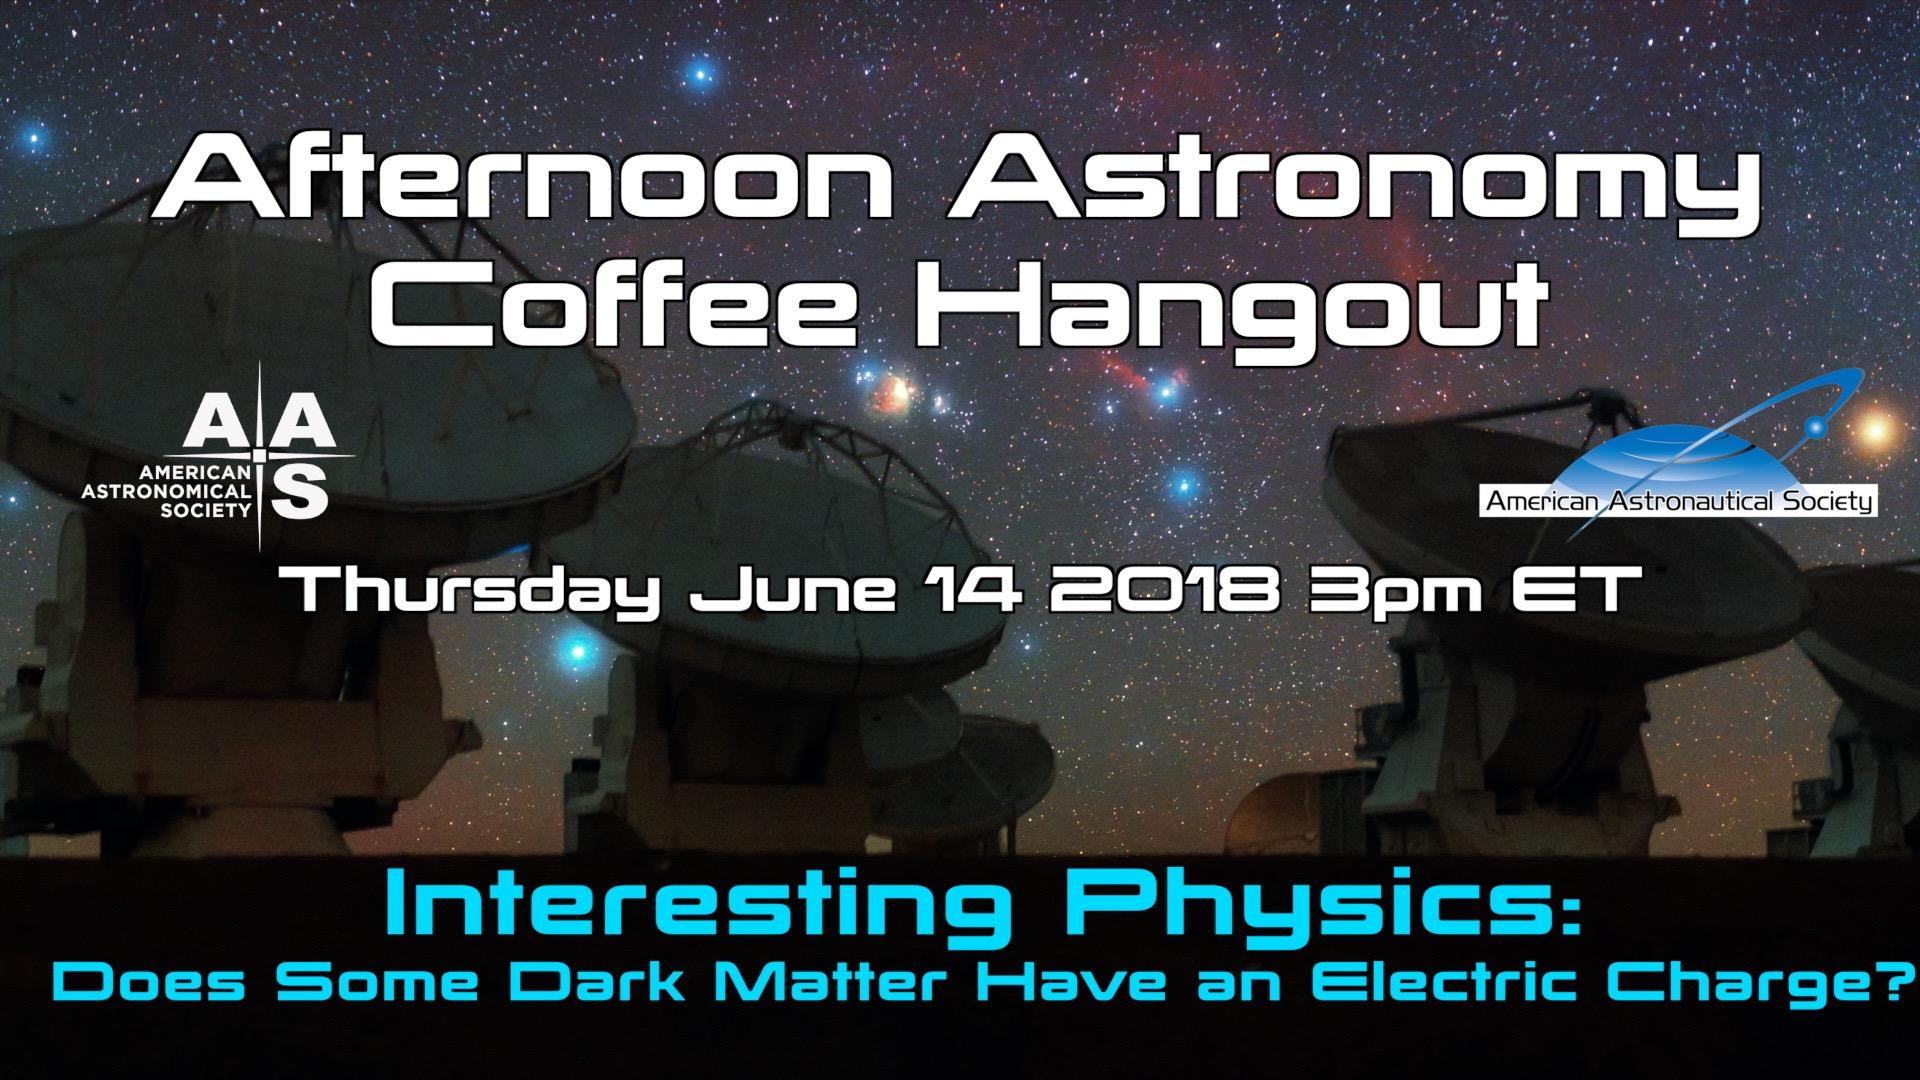 Astronomy Coffee Hangout